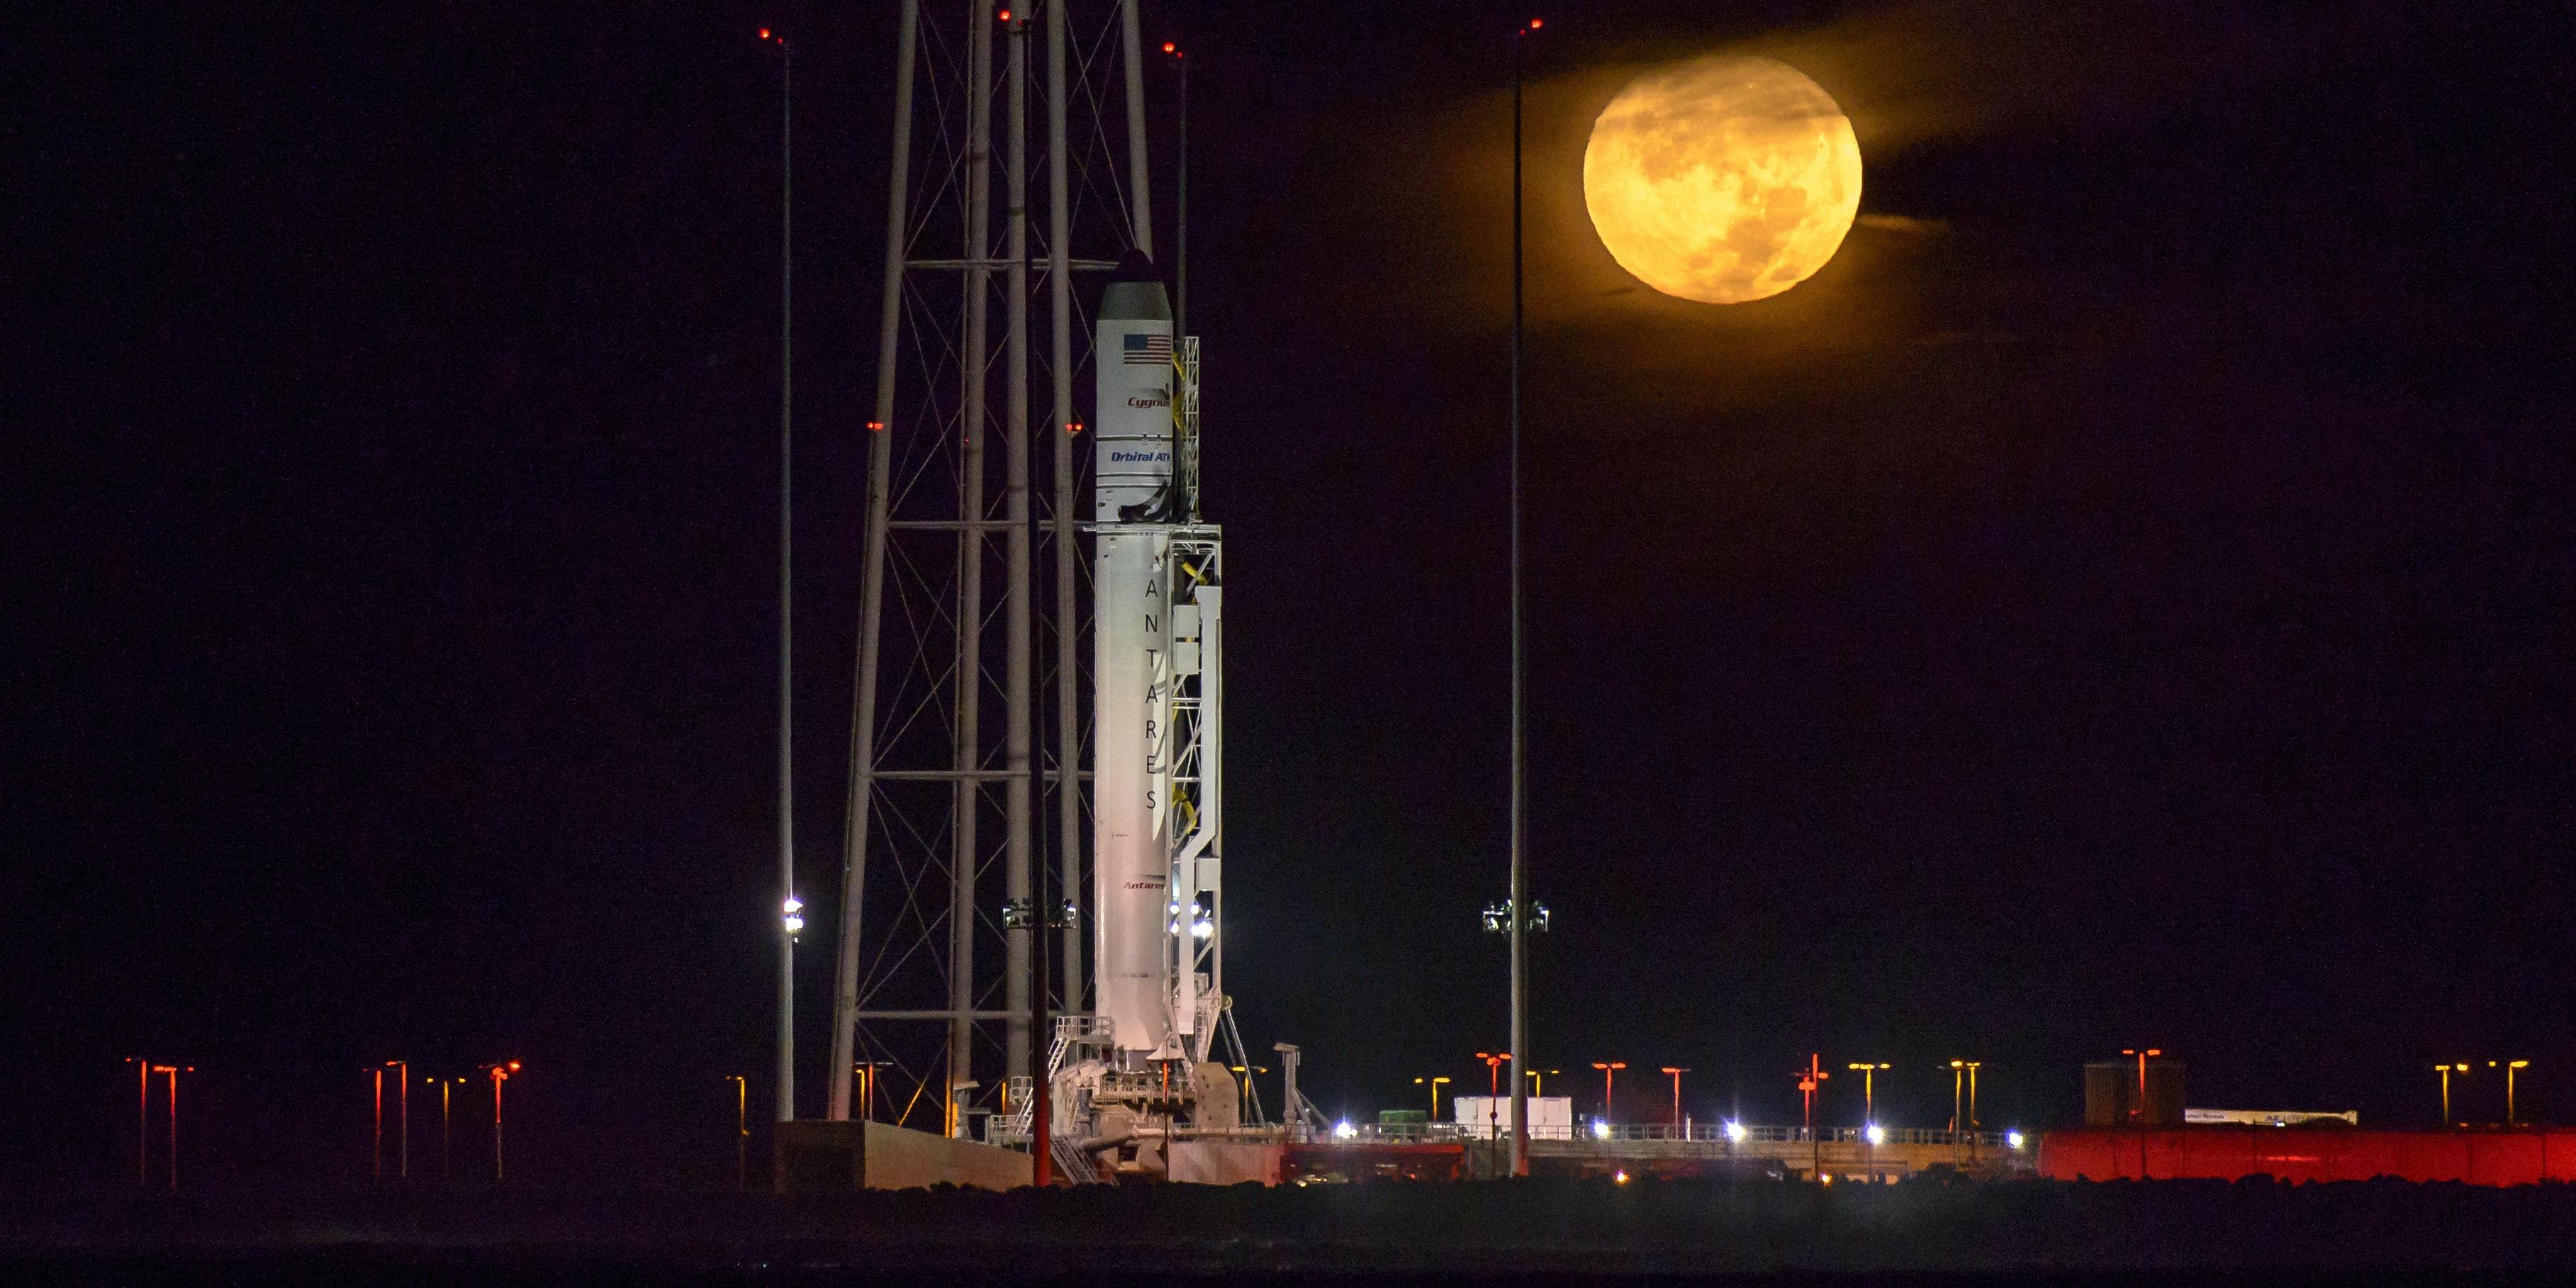 The Orbital ATK Antares rocket is ready to take from Wallops Island, VA on Sunday, October 15.